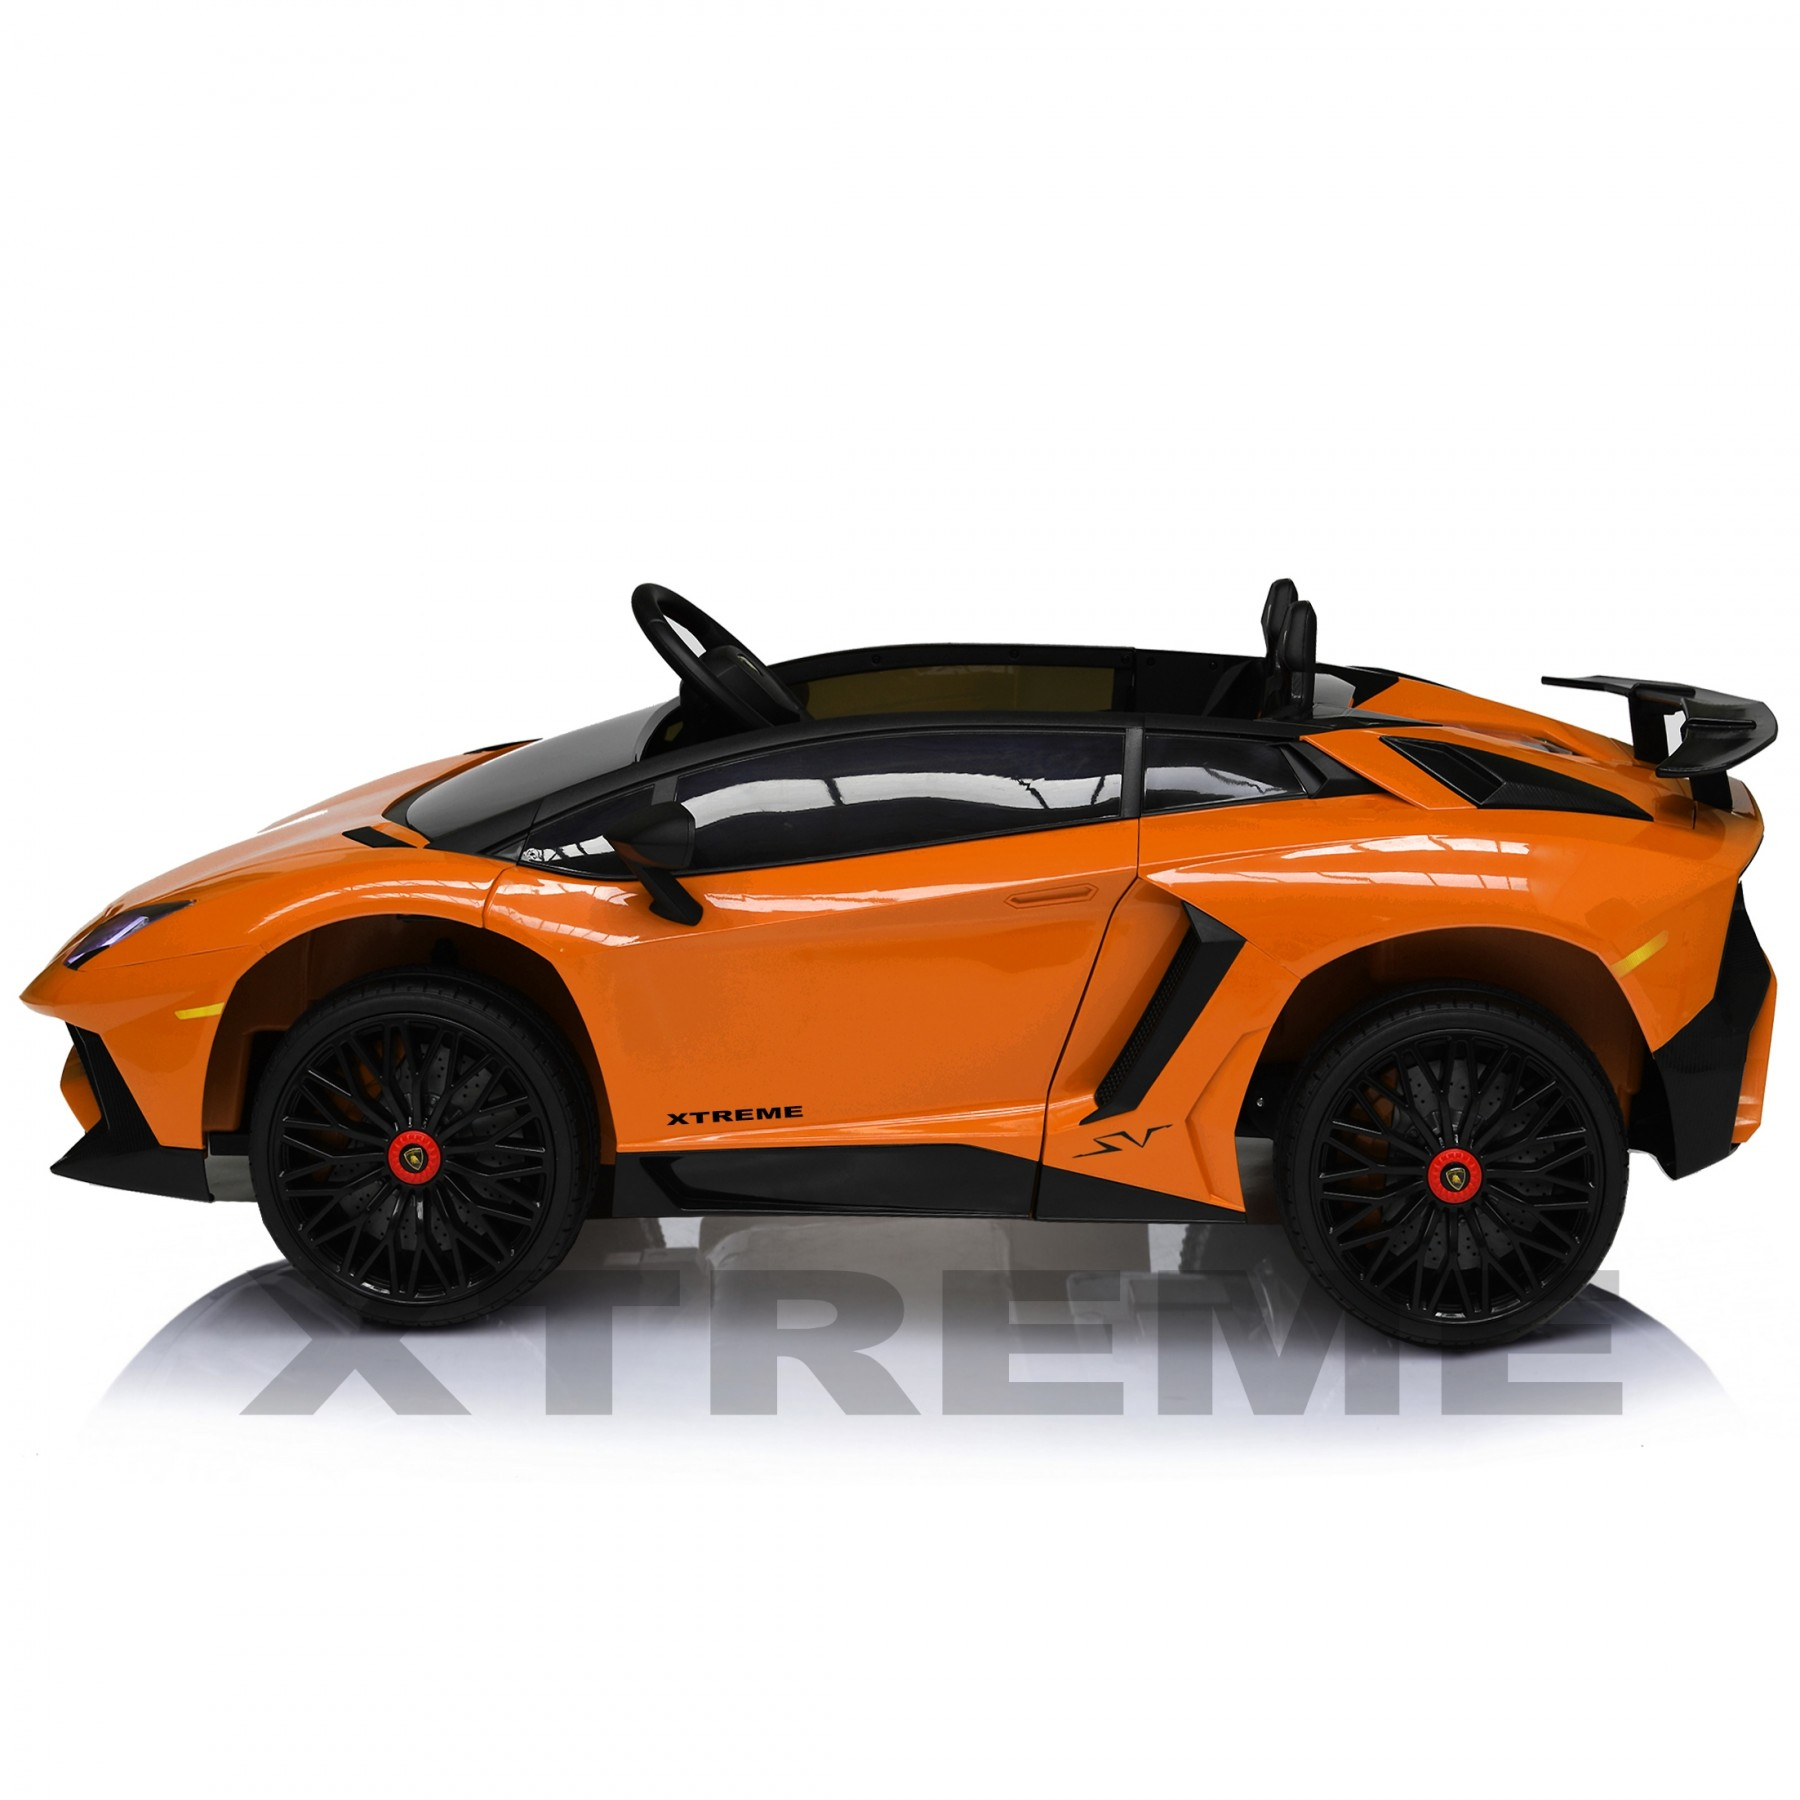 Xtreme 12v Official Licensed Lamborghini Aventador SV Ride on Car Orange